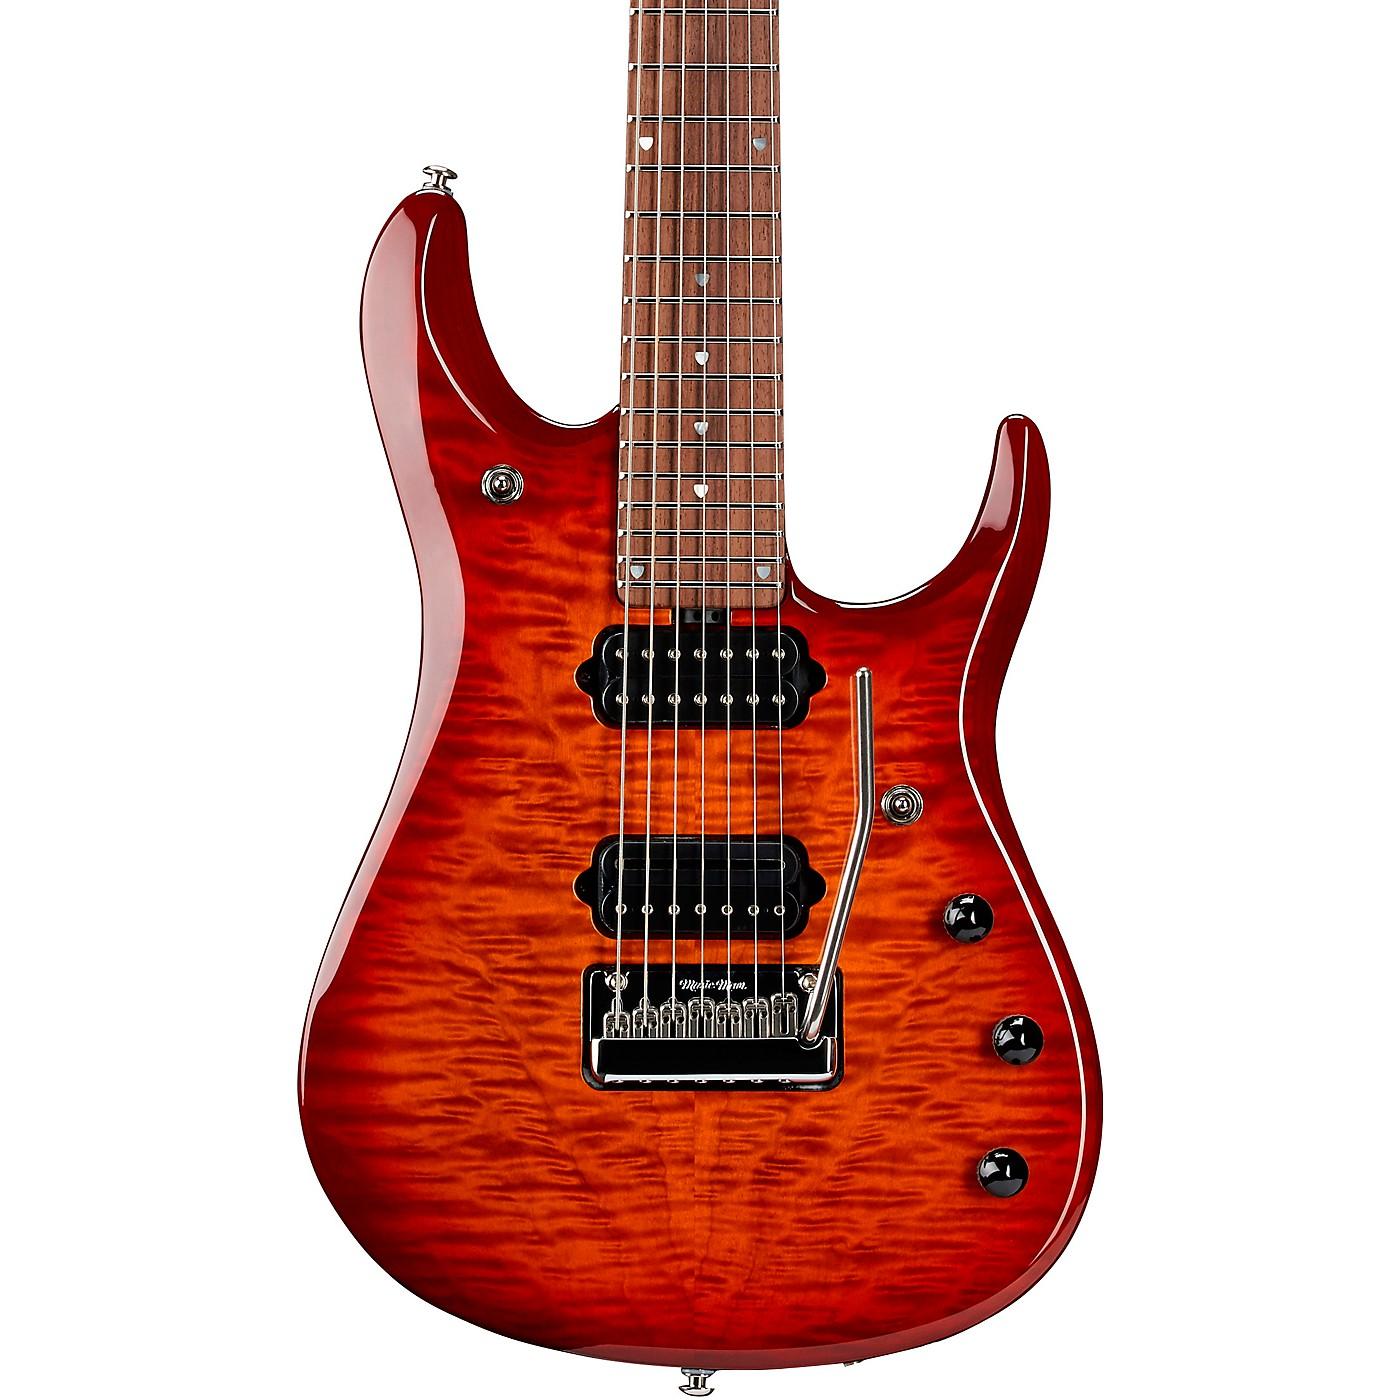 Ernie Ball Music Man John Petrucci 7 JP7 Flame Maple Top Rosewood Fingerboard Electric Guitar thumbnail